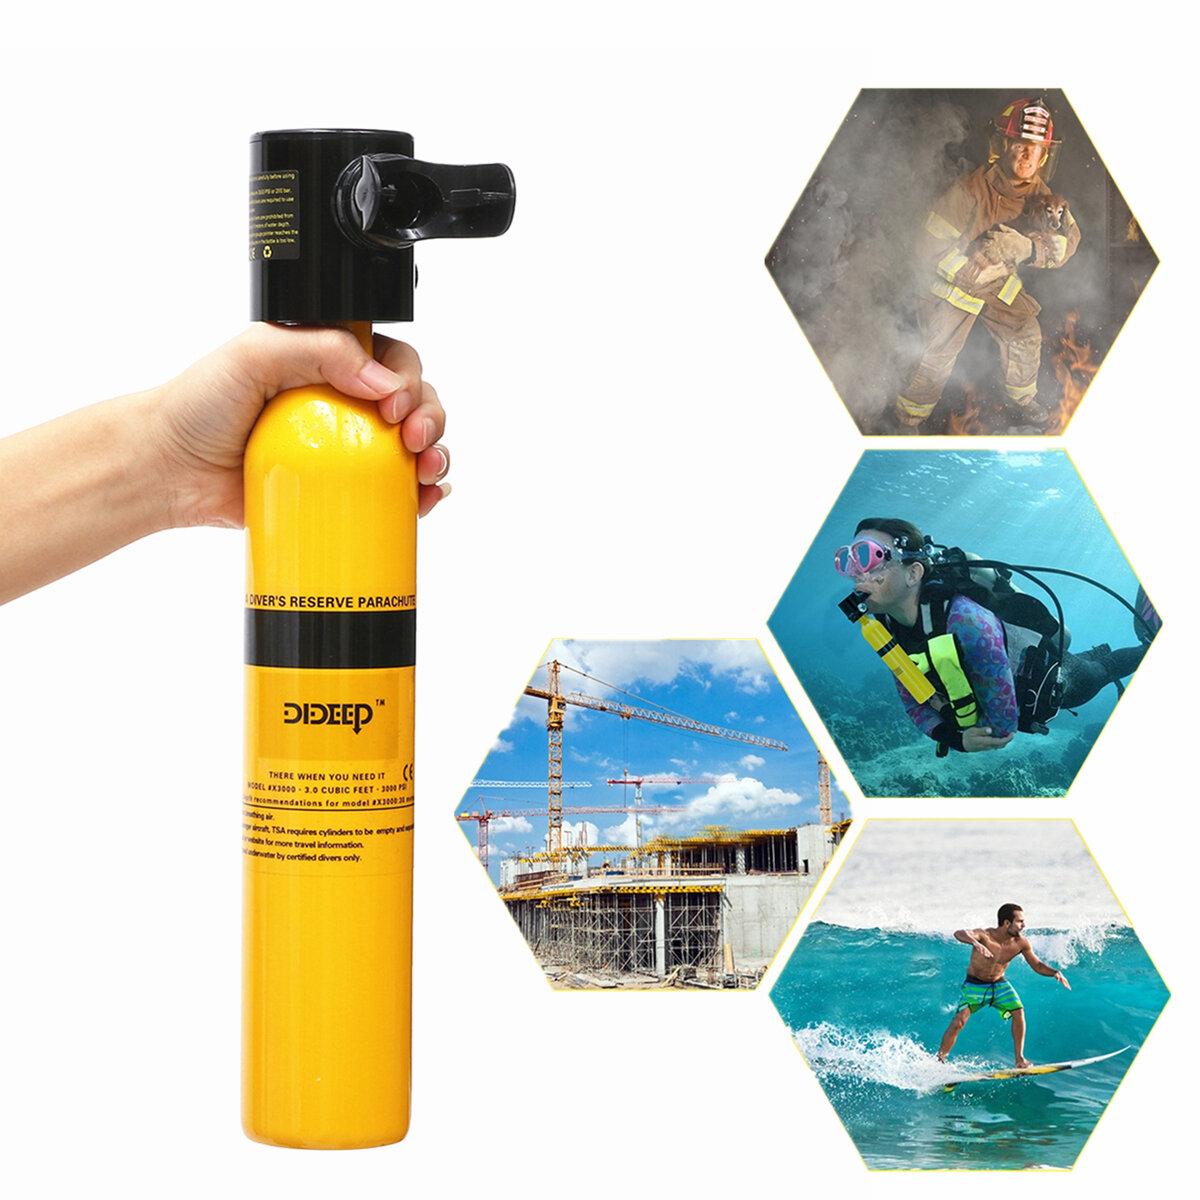 Oxygen Tank For Sale >> Oxygen Cylinder Diving Mini Scuba Cylinder Oxygen Tank Underwater Breath Equipment